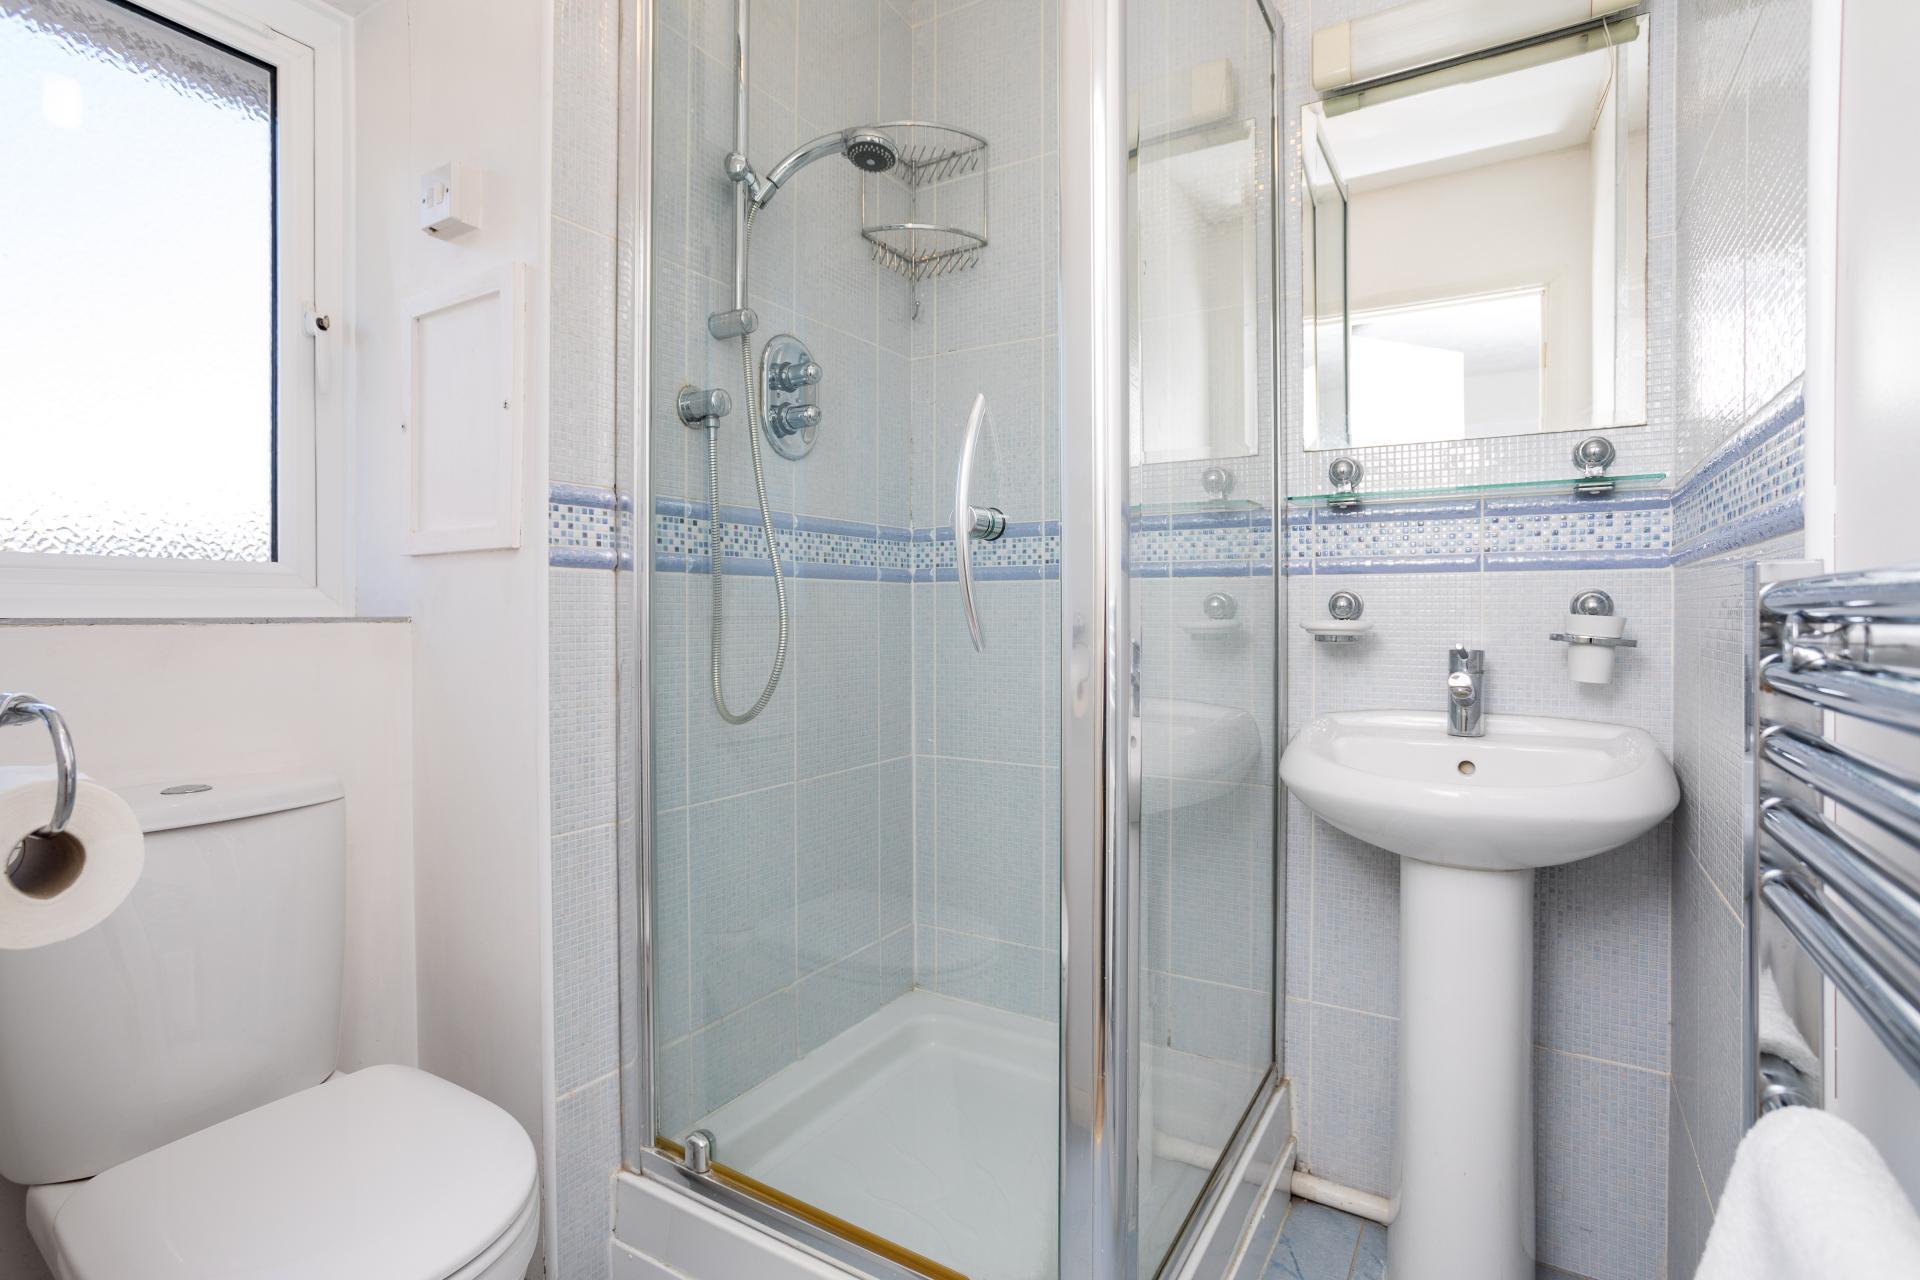 Sink at Graveney House, Maidenbower, Crawley